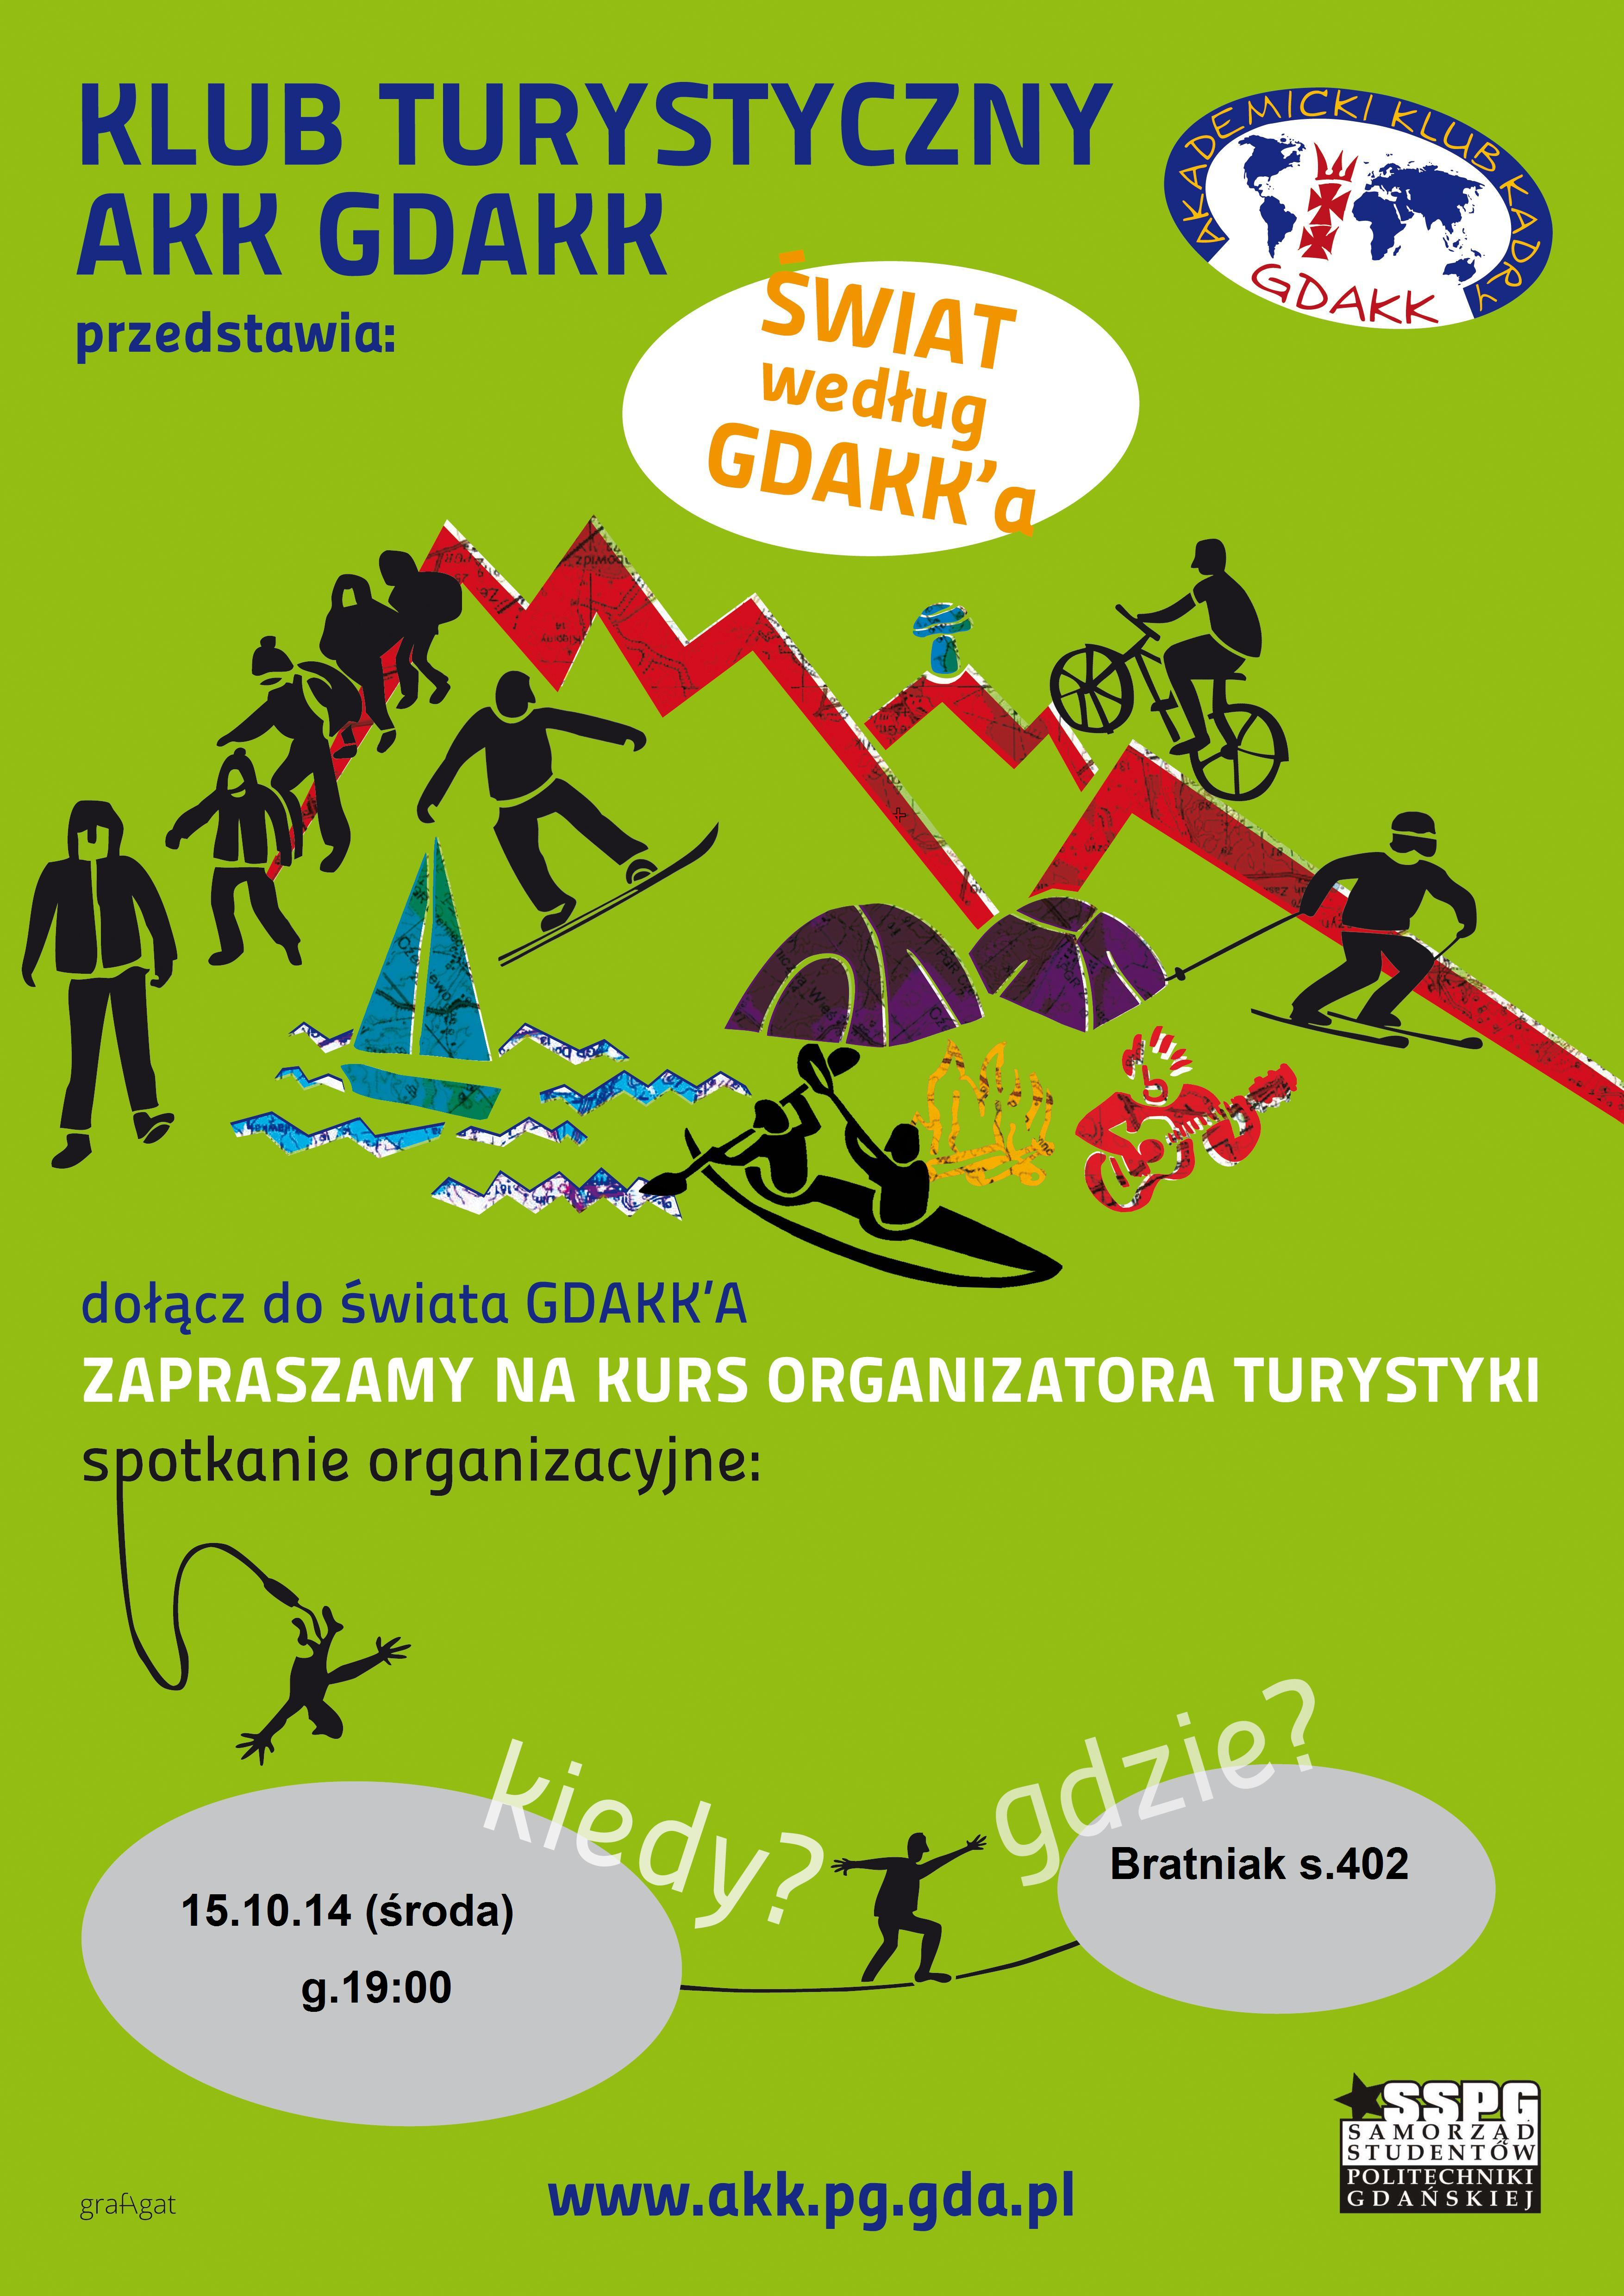 plakat organizatora turystyki wersja do druku